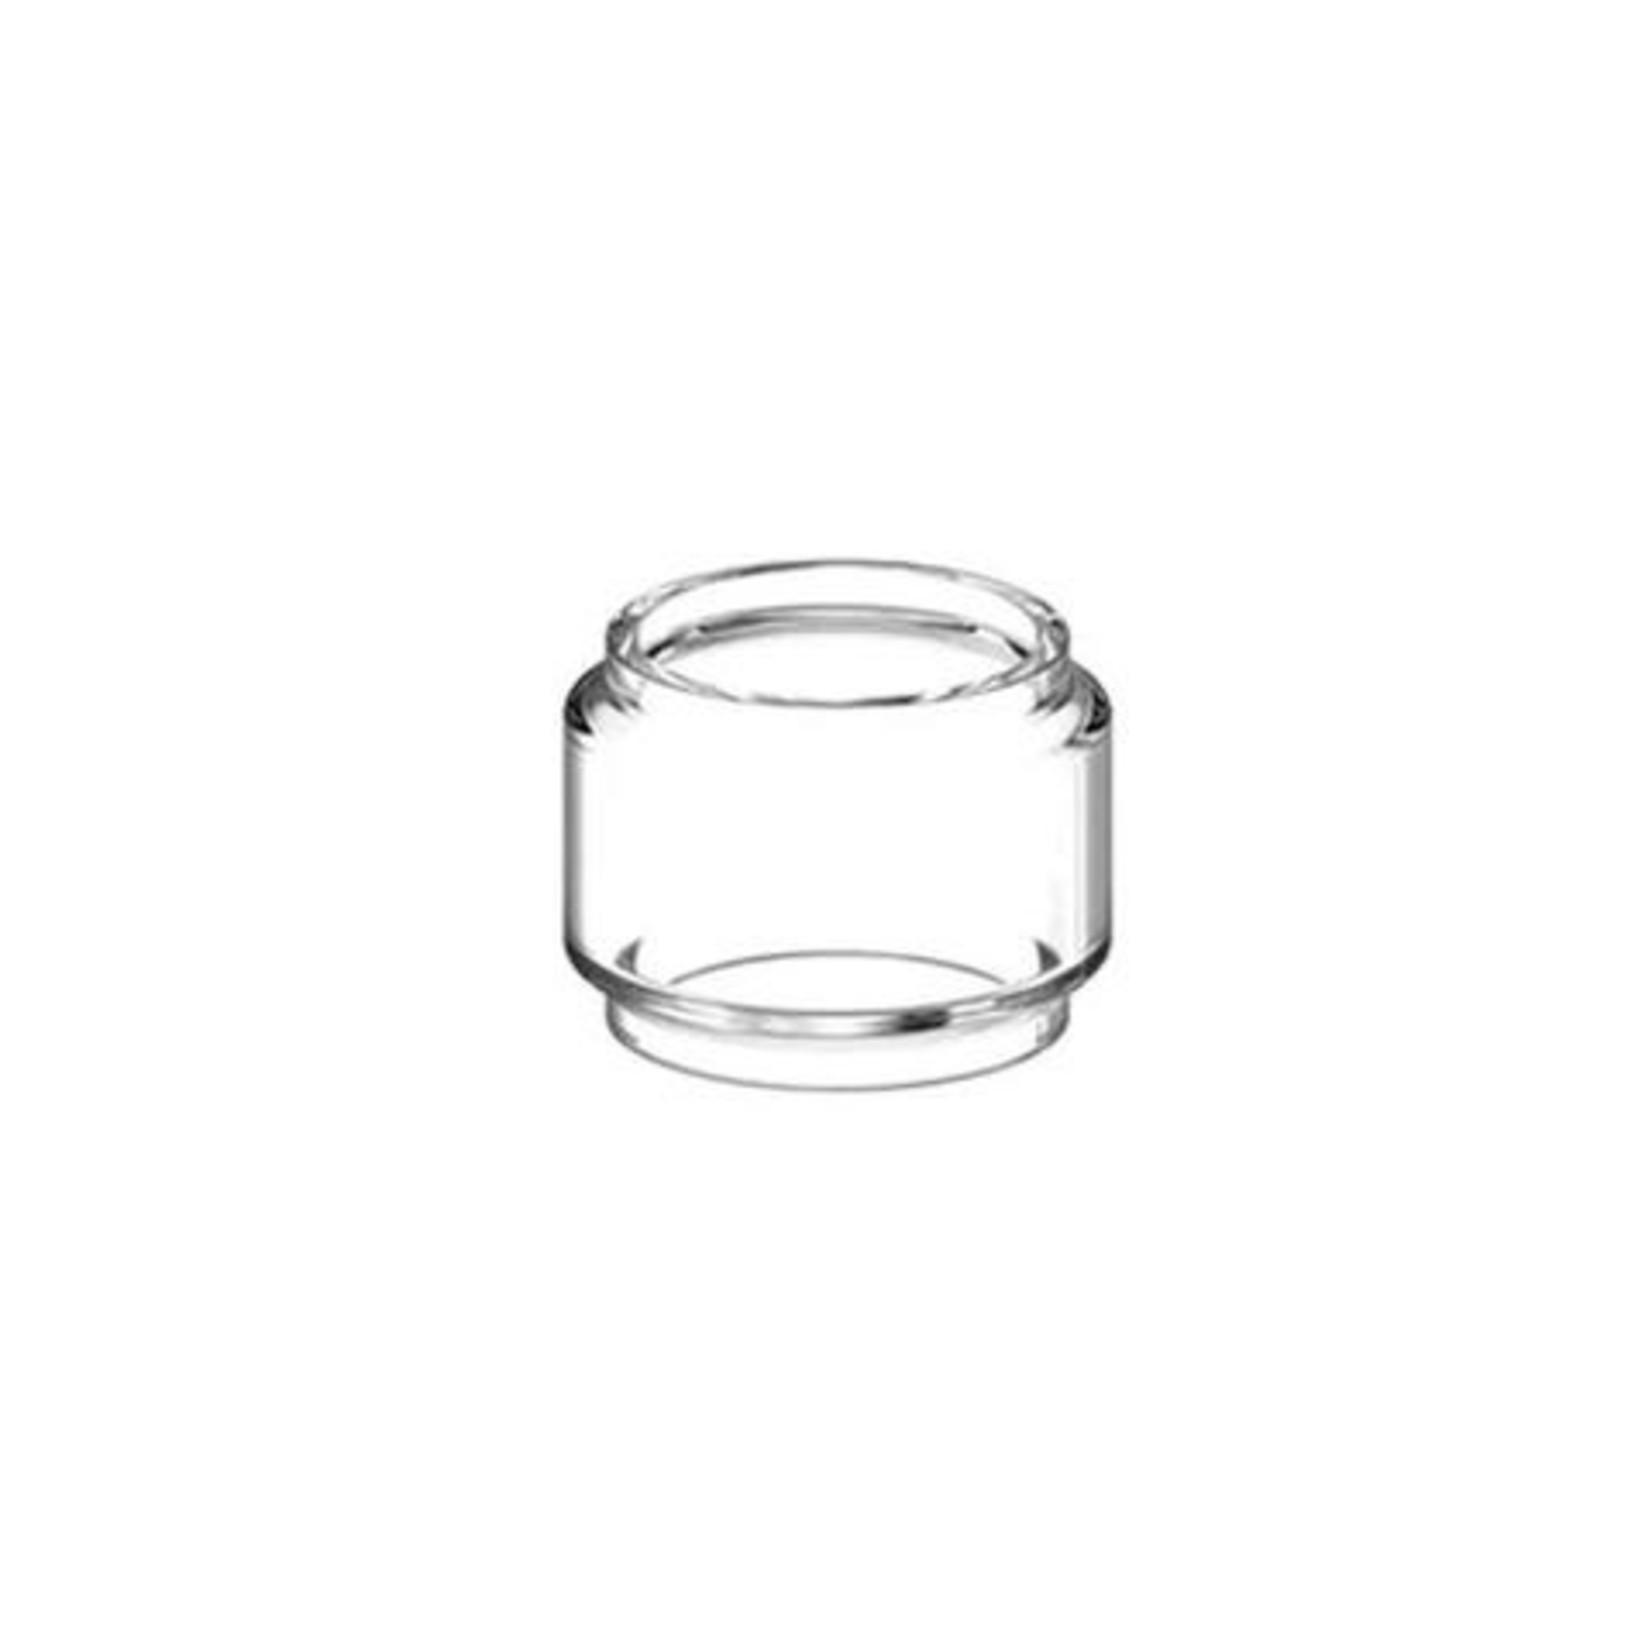 Horizon Falcon 2 Replacent Bulb Glass ( 5.2ml )